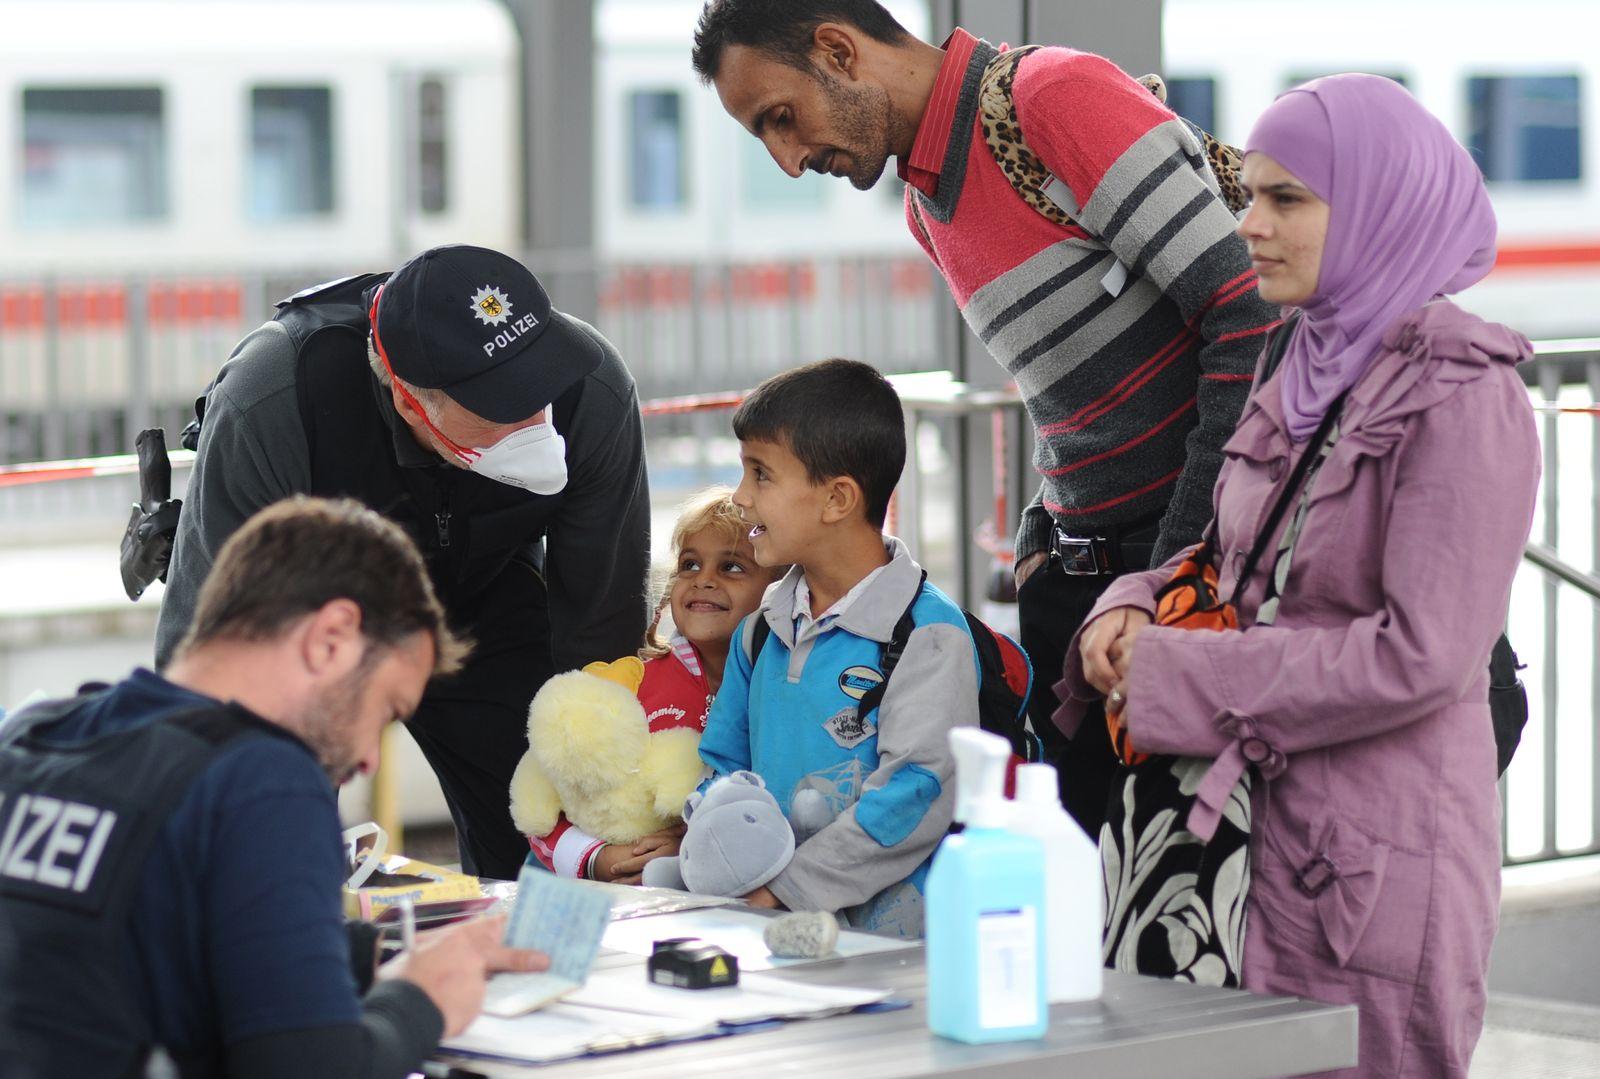 Bayern/ Rosenheim/ Flüchtlinge/ Polizisten